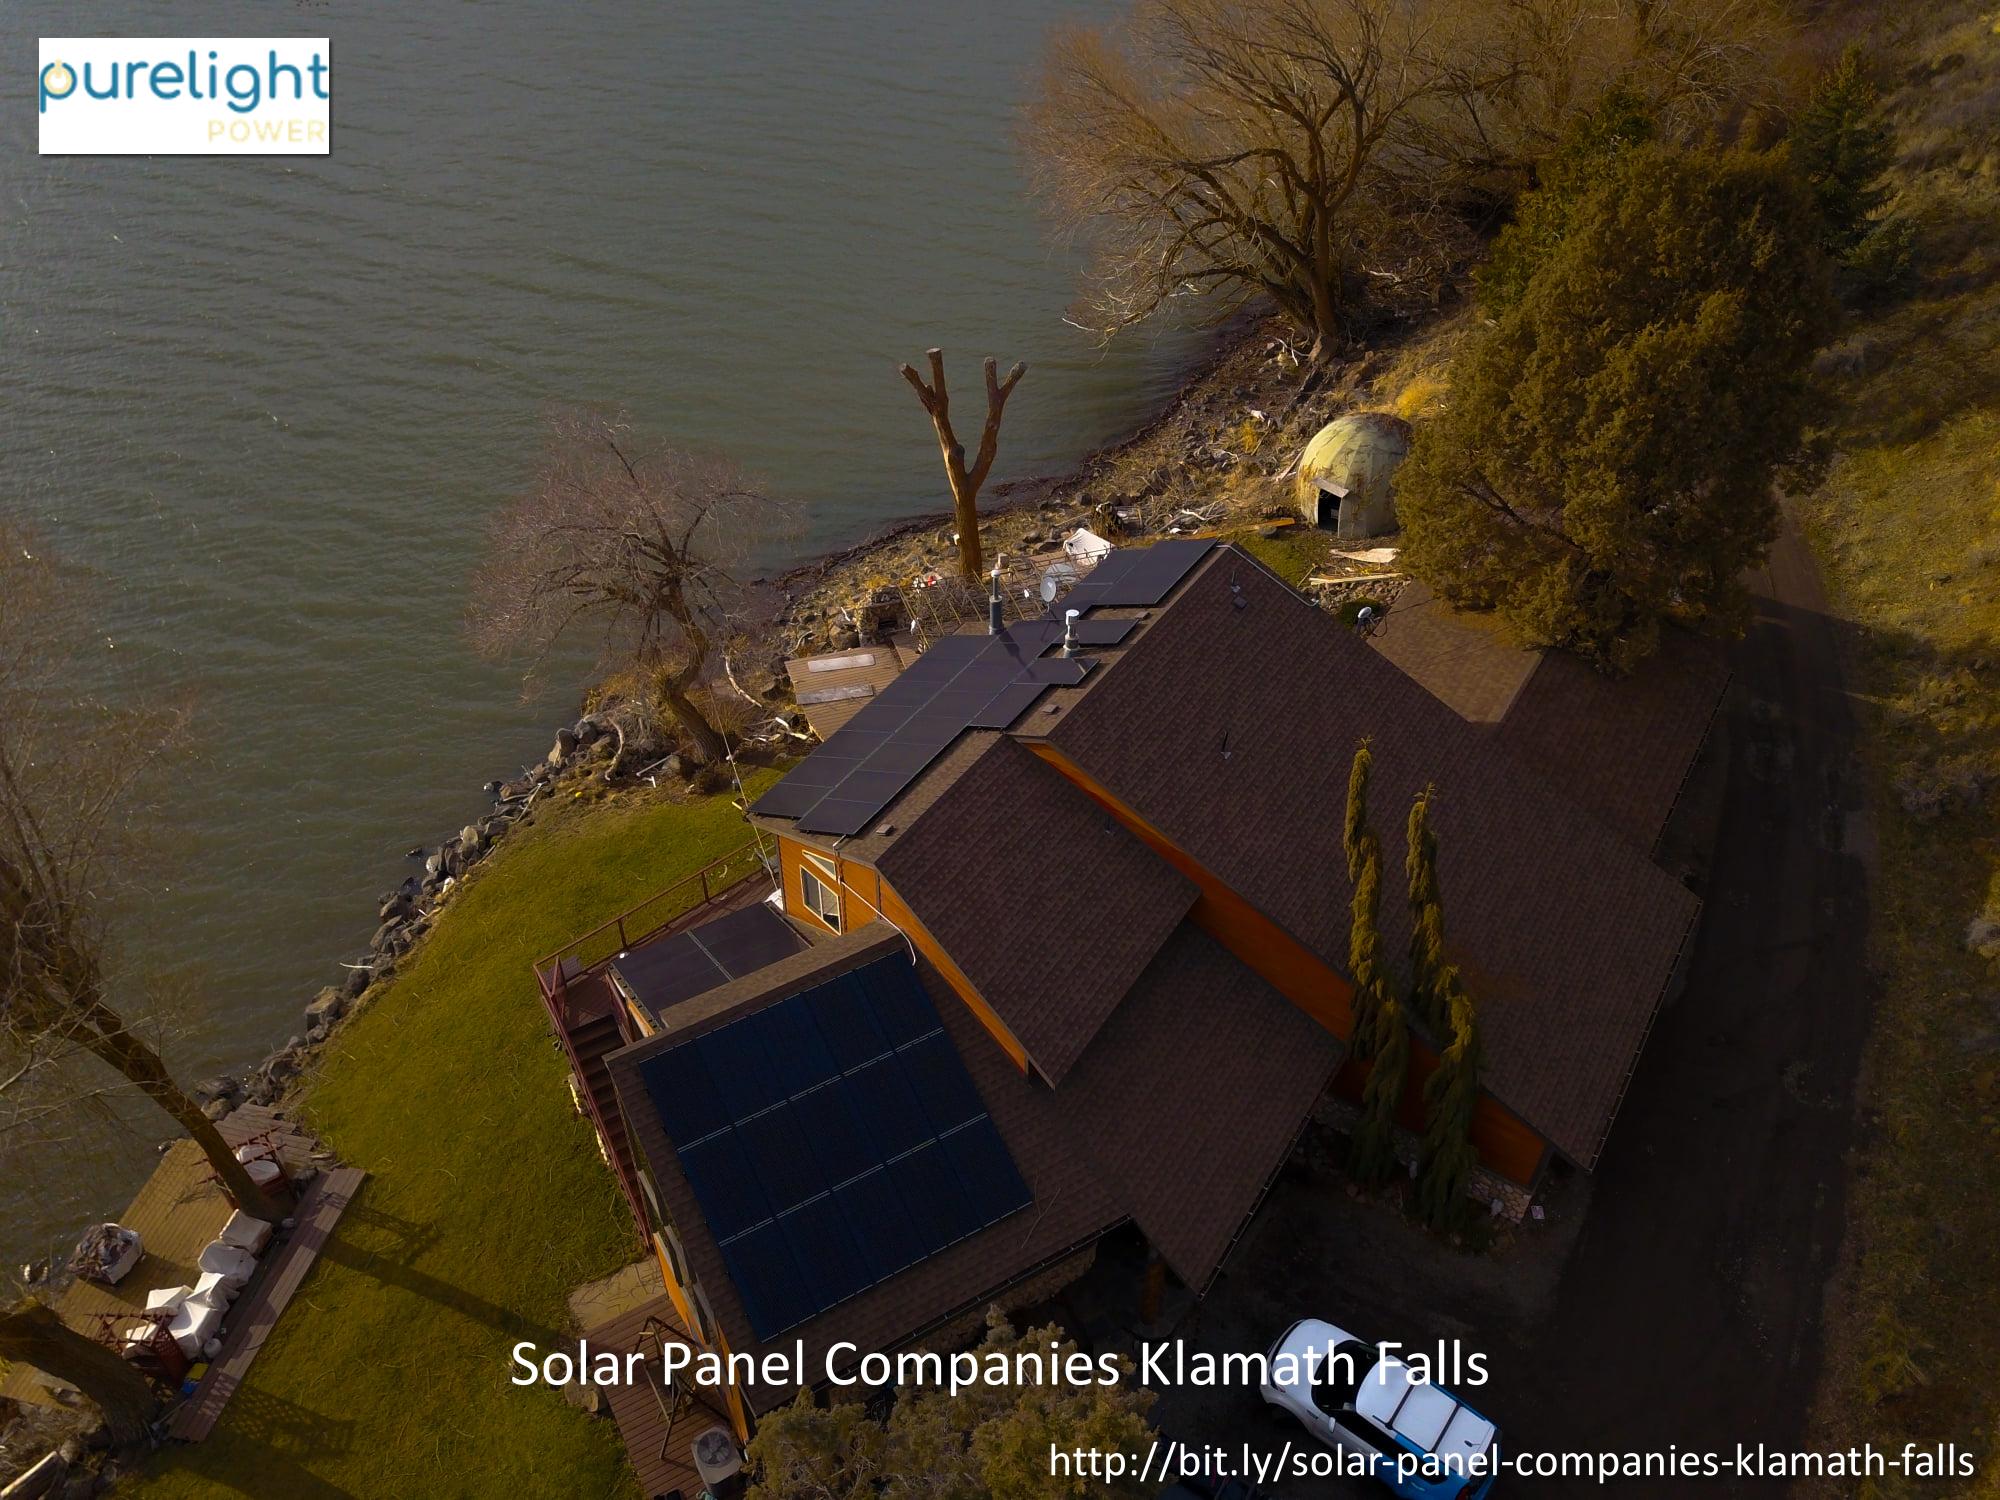 Purelight Power Klamath Falls Launches Solar Company Klamath Falls